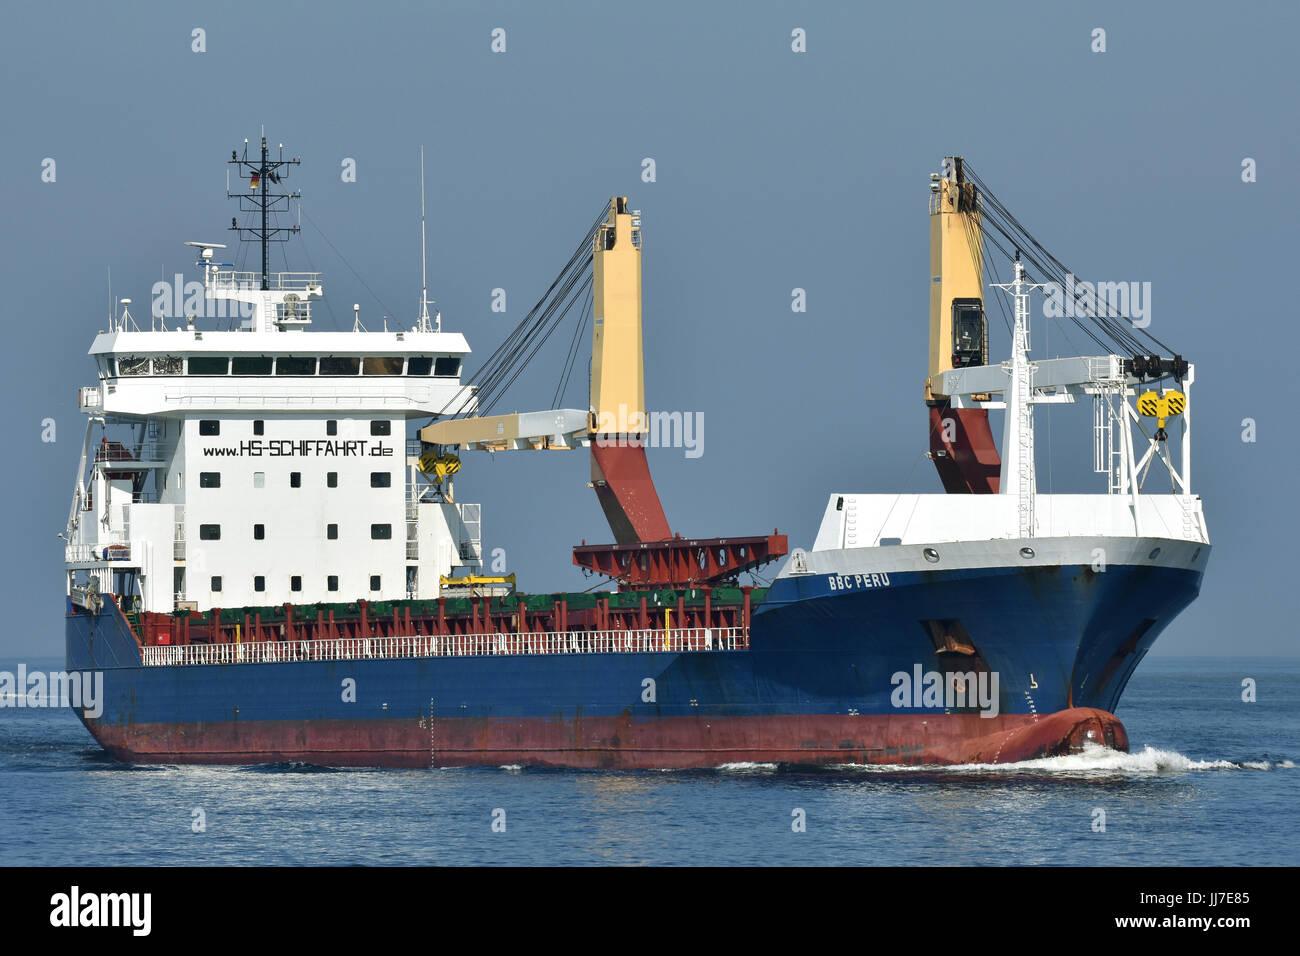 General Cargo Ship BBC Peru Stock Photo: 148911621 - Alamy